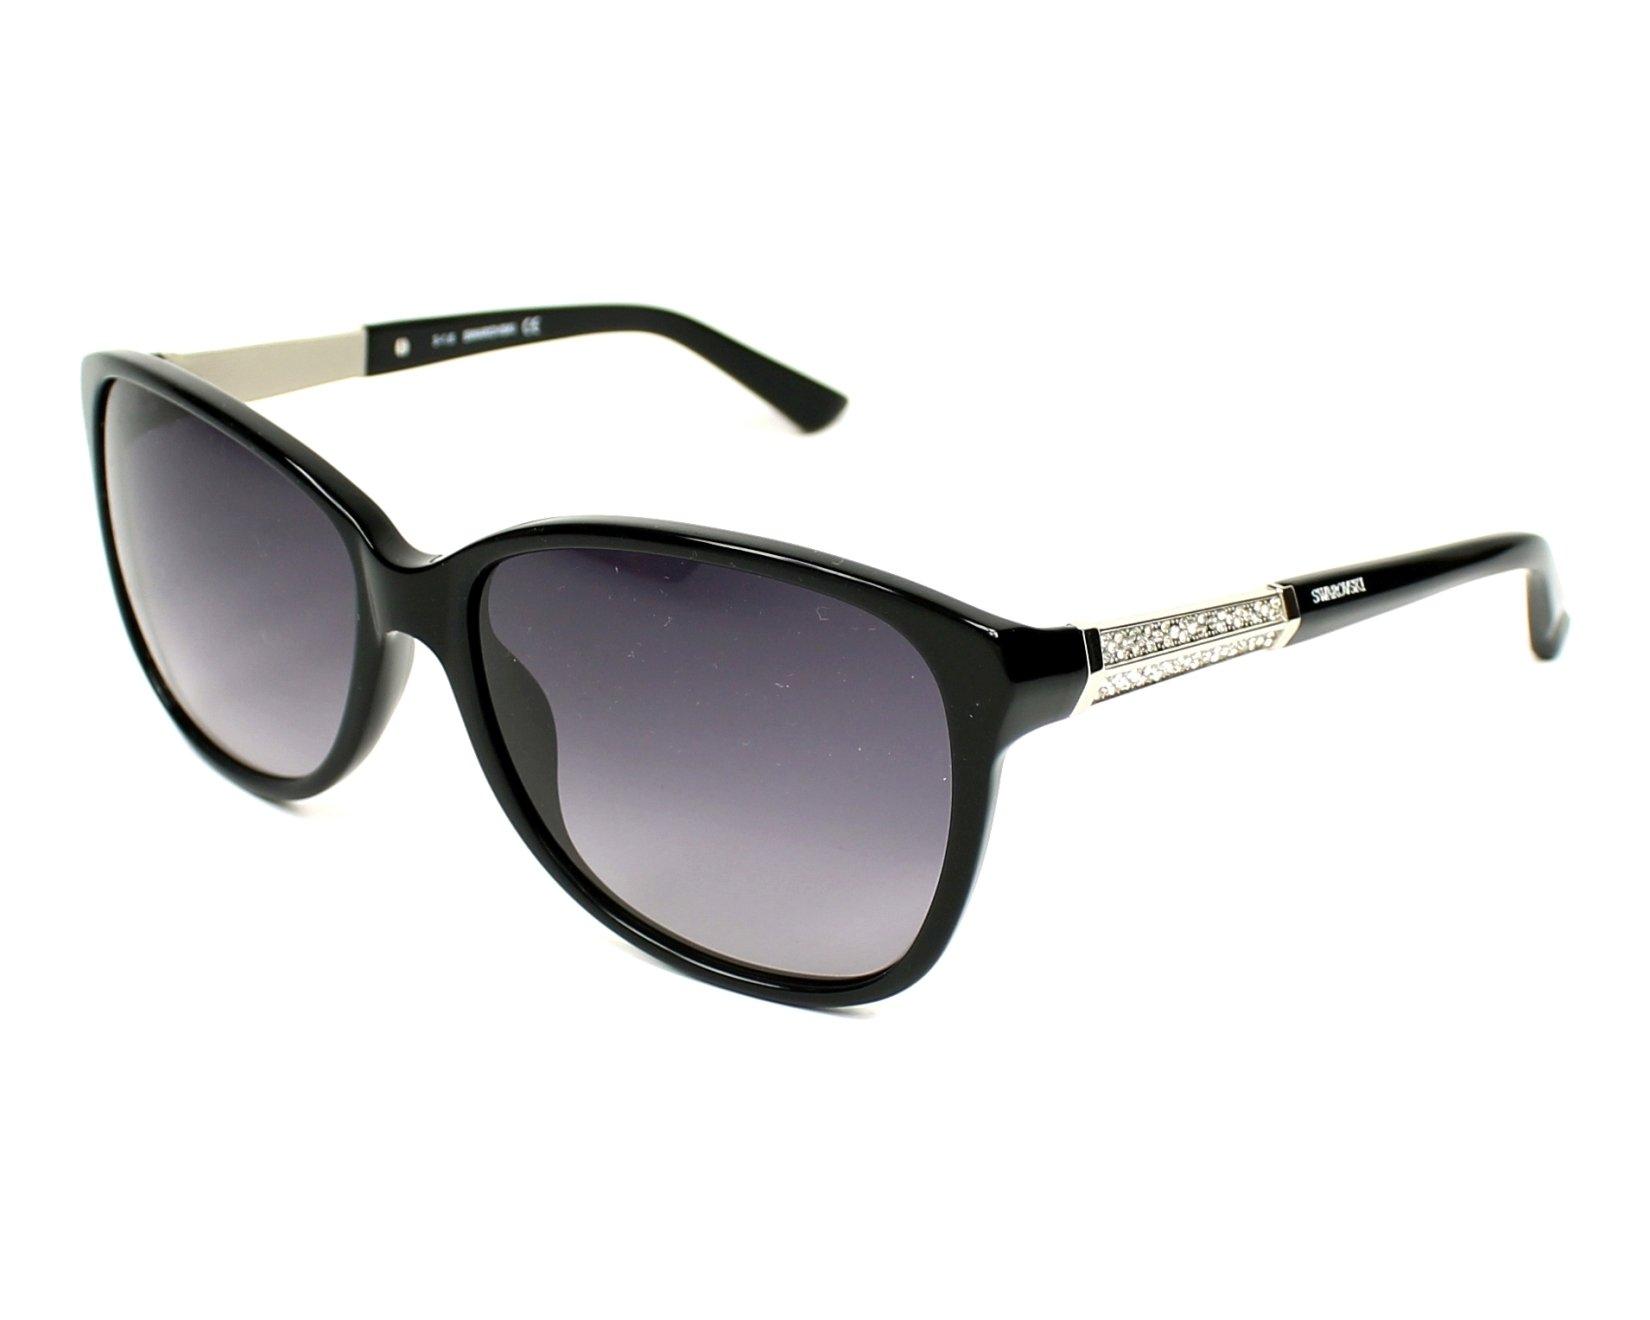 d3e848fdfe Gafas de sol Swarovski SW-83 01B - Negra Plata vista de perfil